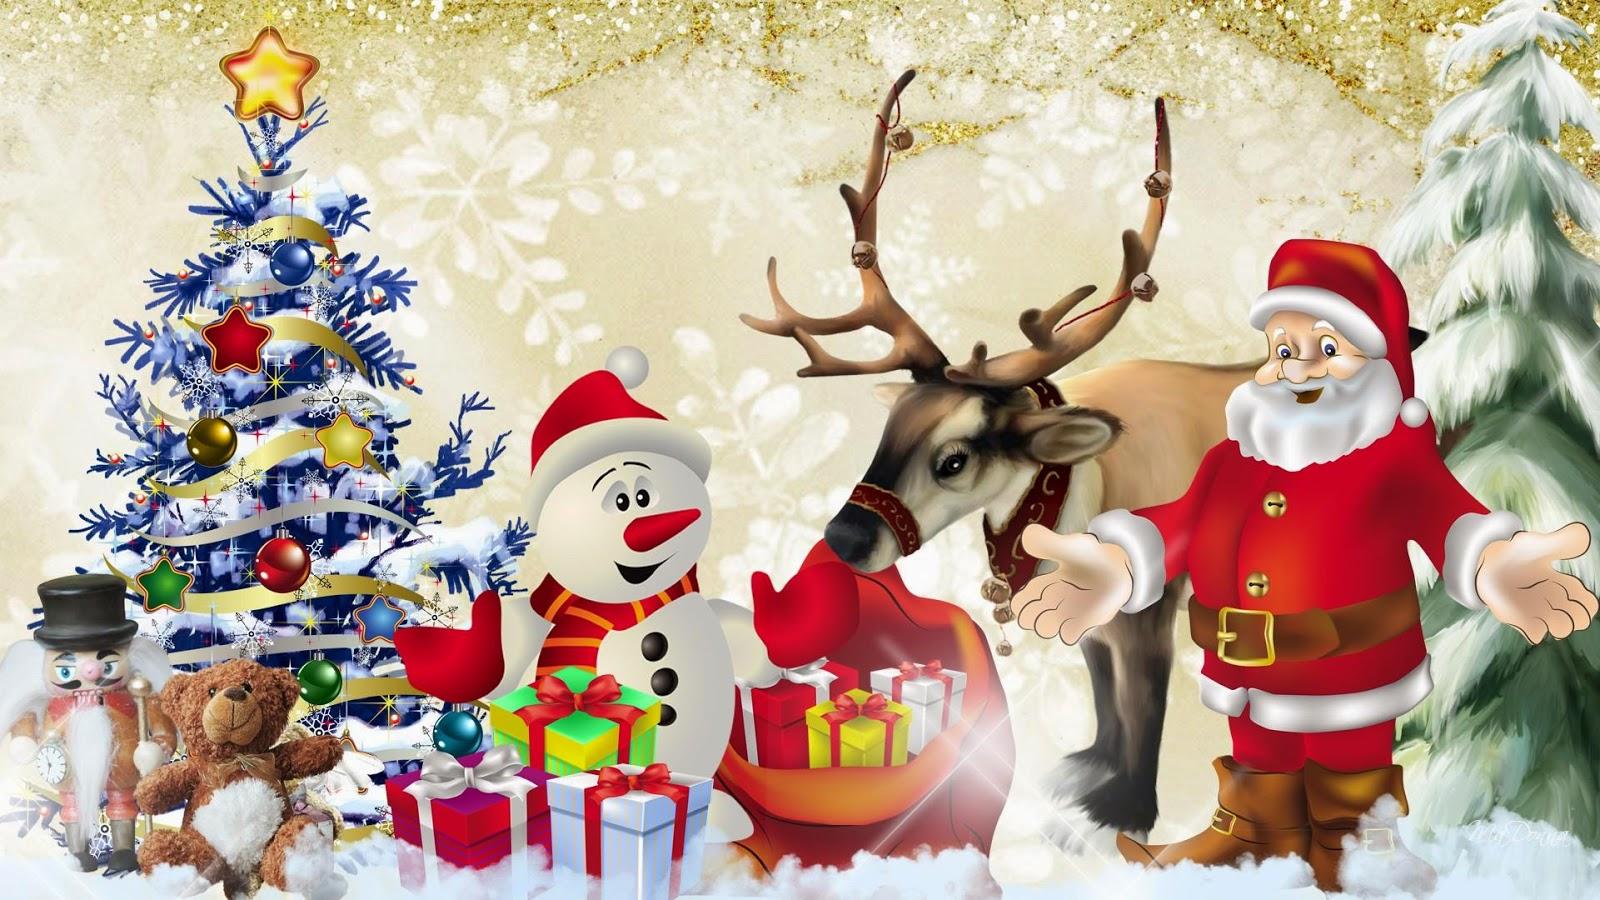 santa-friends-reindeer-snowman-xmas-tree-Christmas-cartoon-wallpaper.jpg